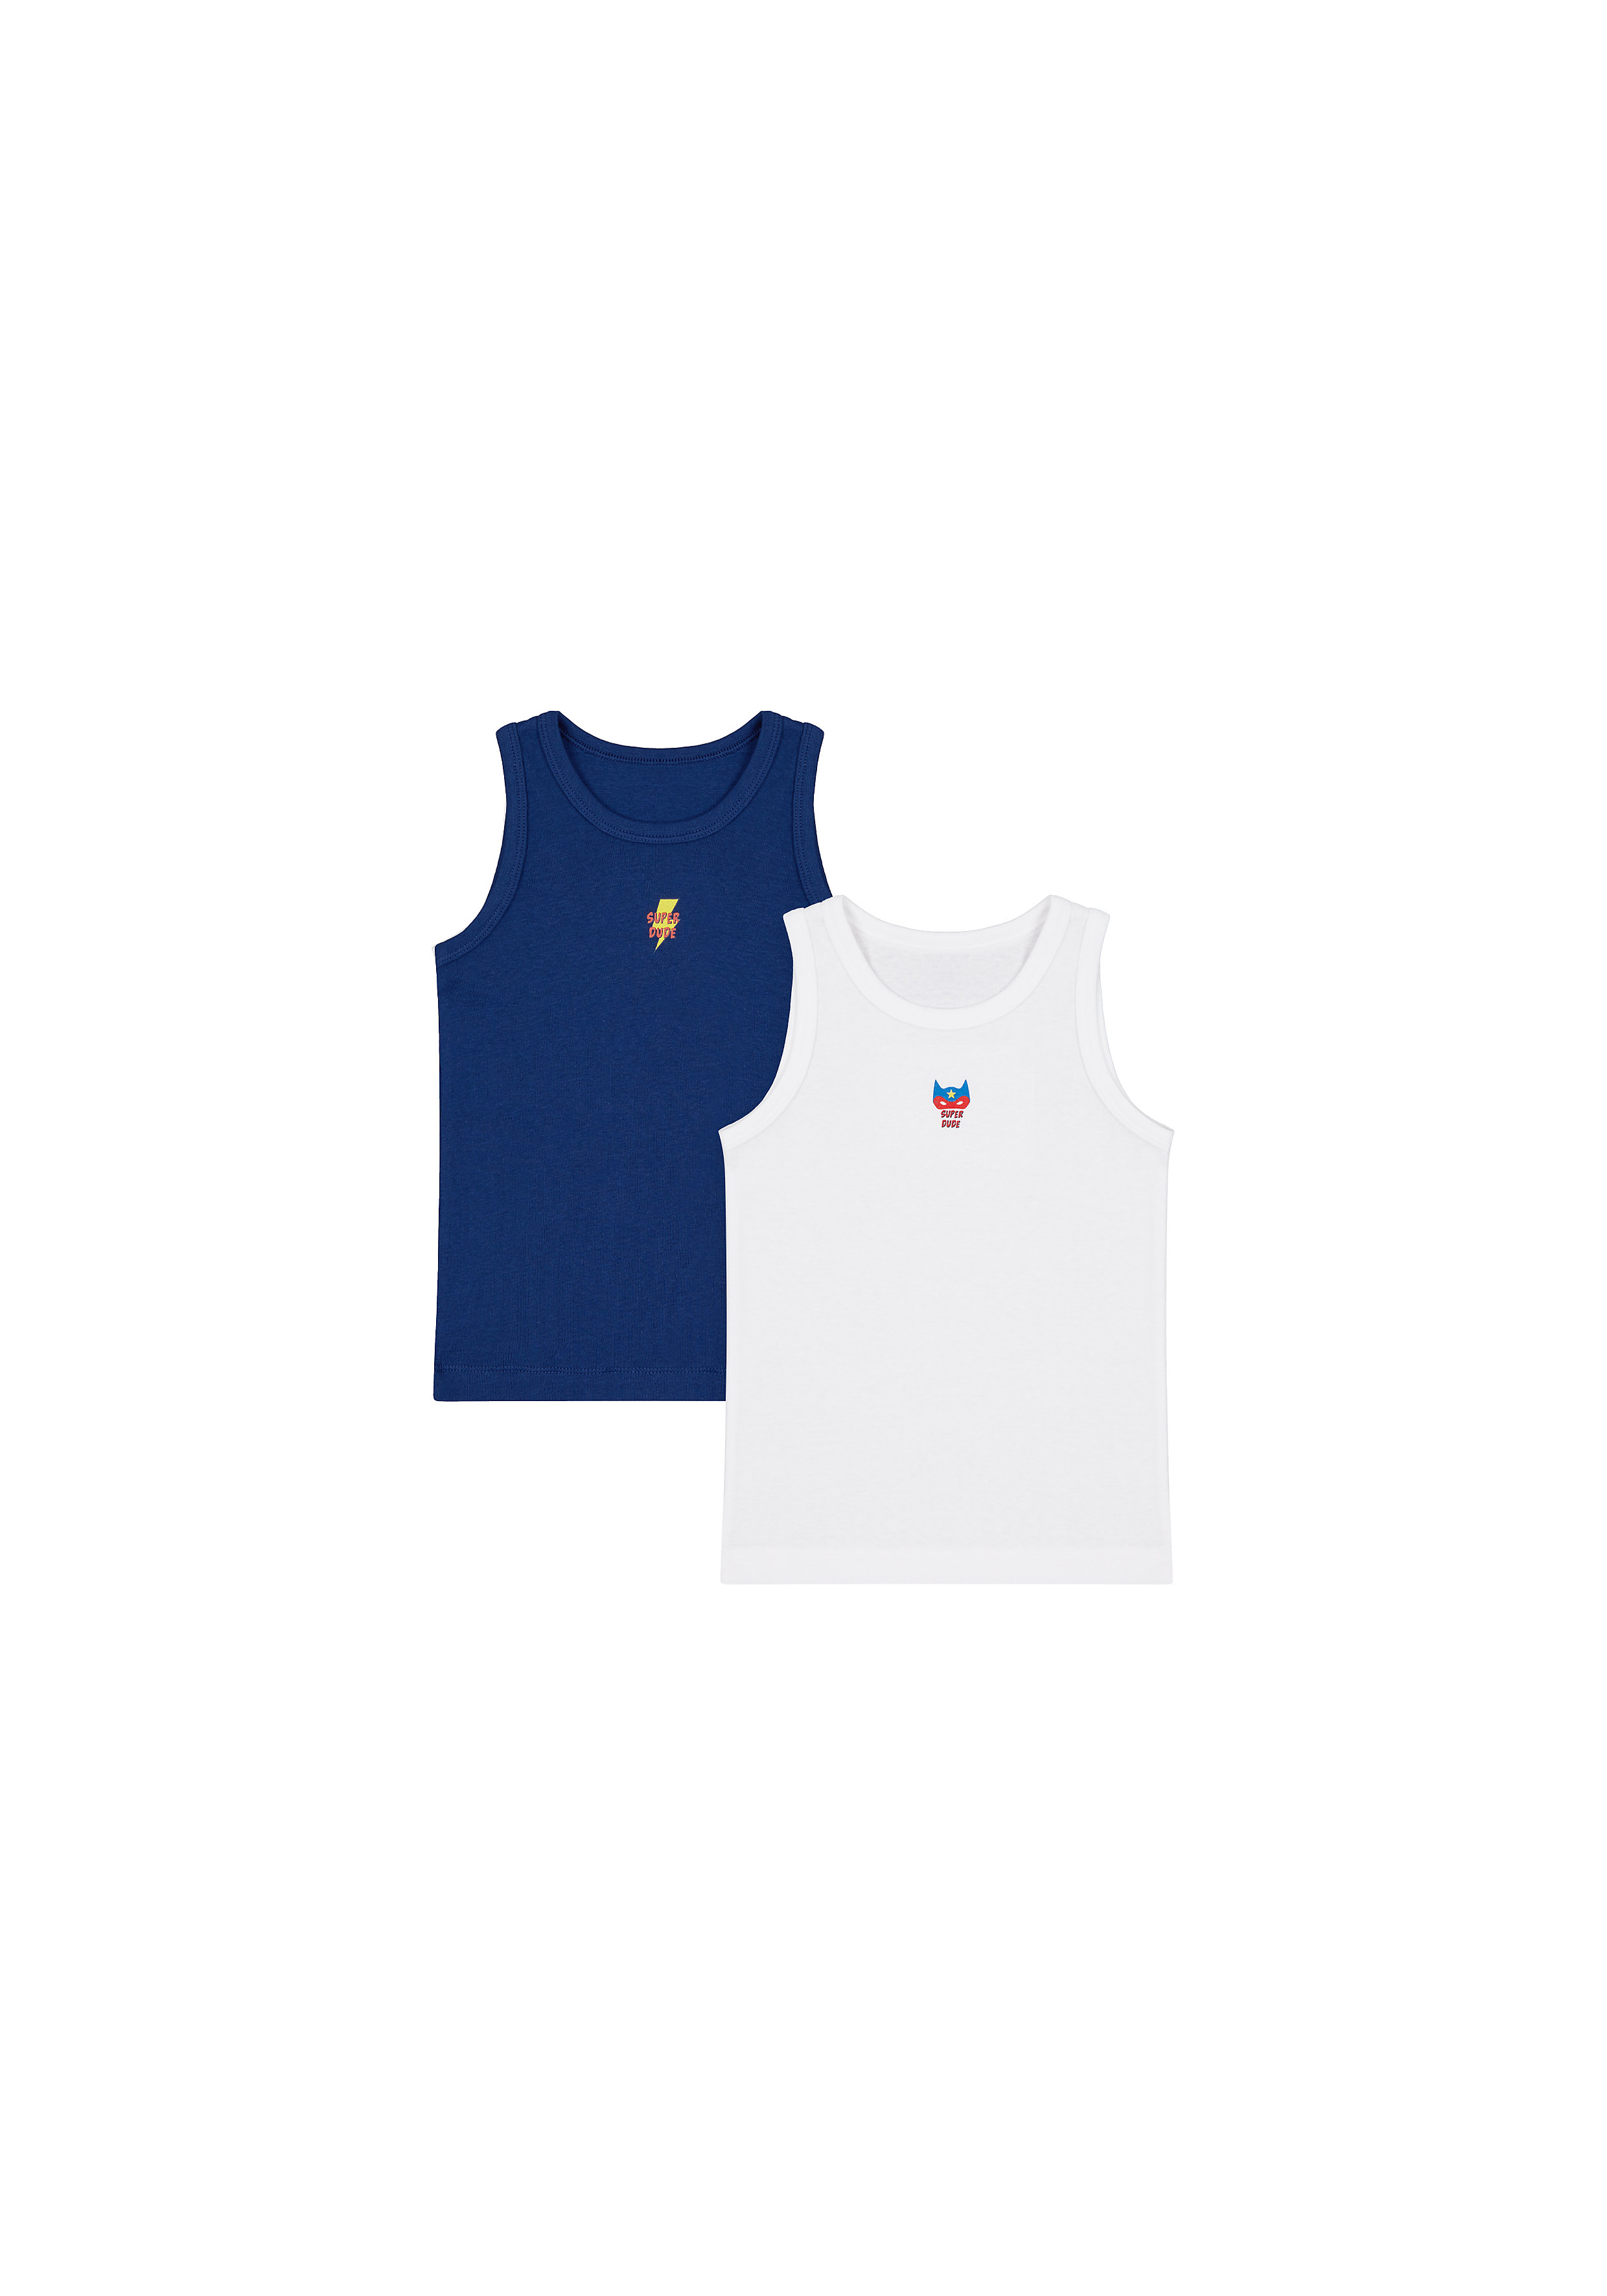 Mothercare | Boys Sleeveless Vest Text Print - Pack Of 2 - Navy White